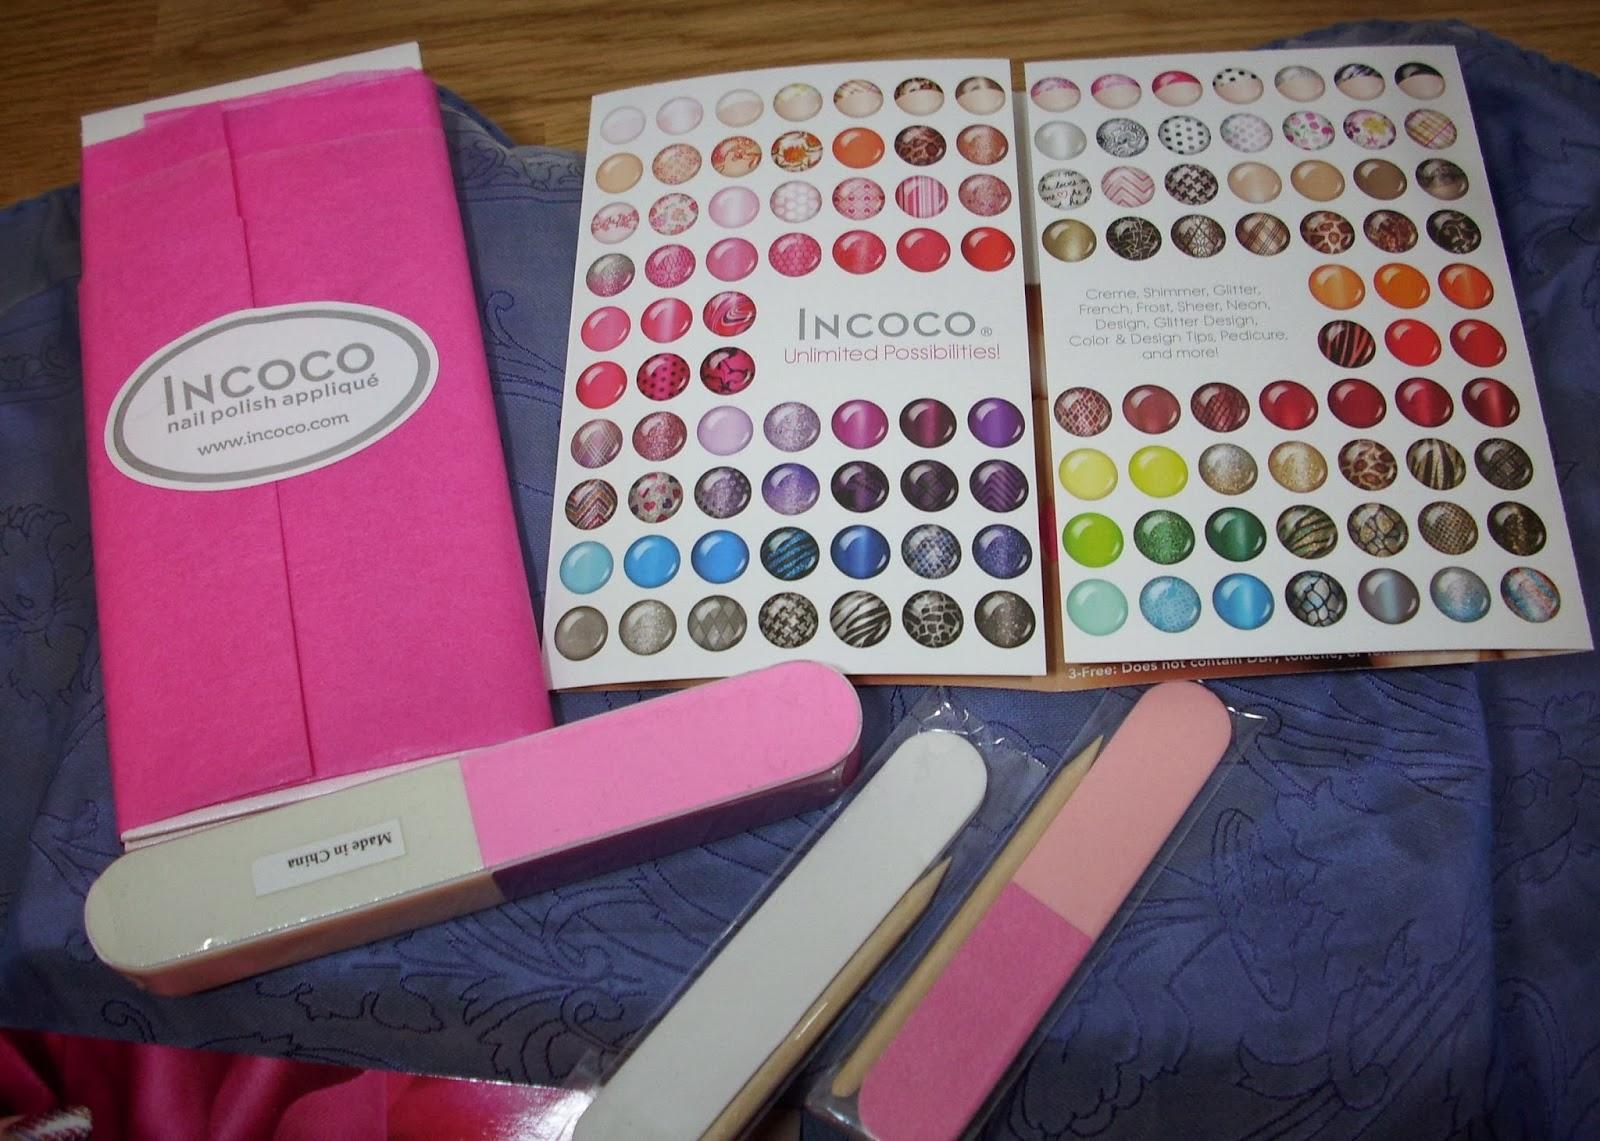 Did someone say nail polish?: incoco nail polish applique in